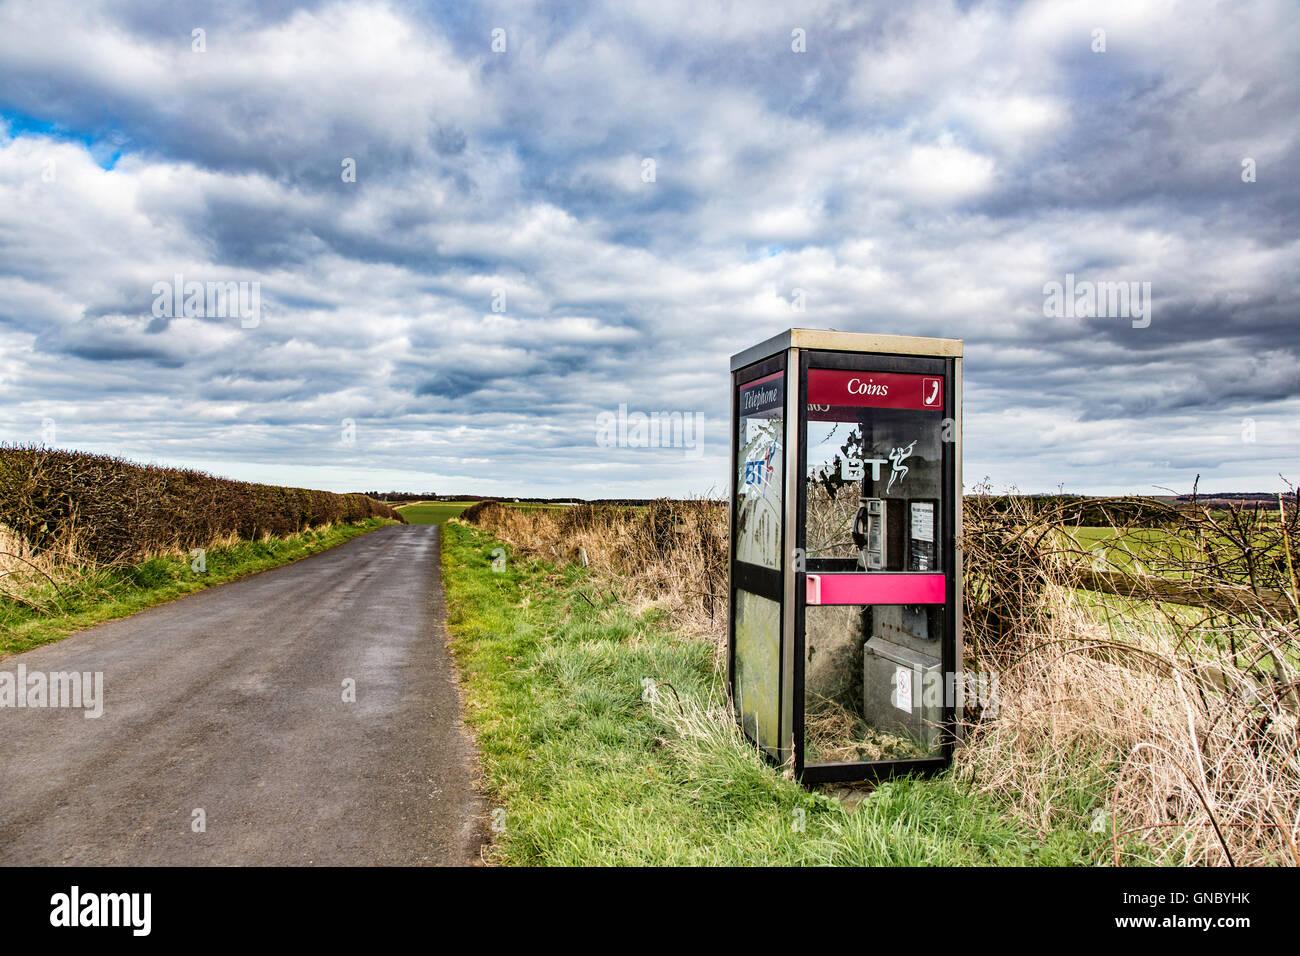 Remote rural KX10 telephone box, England, UK - Stock Image